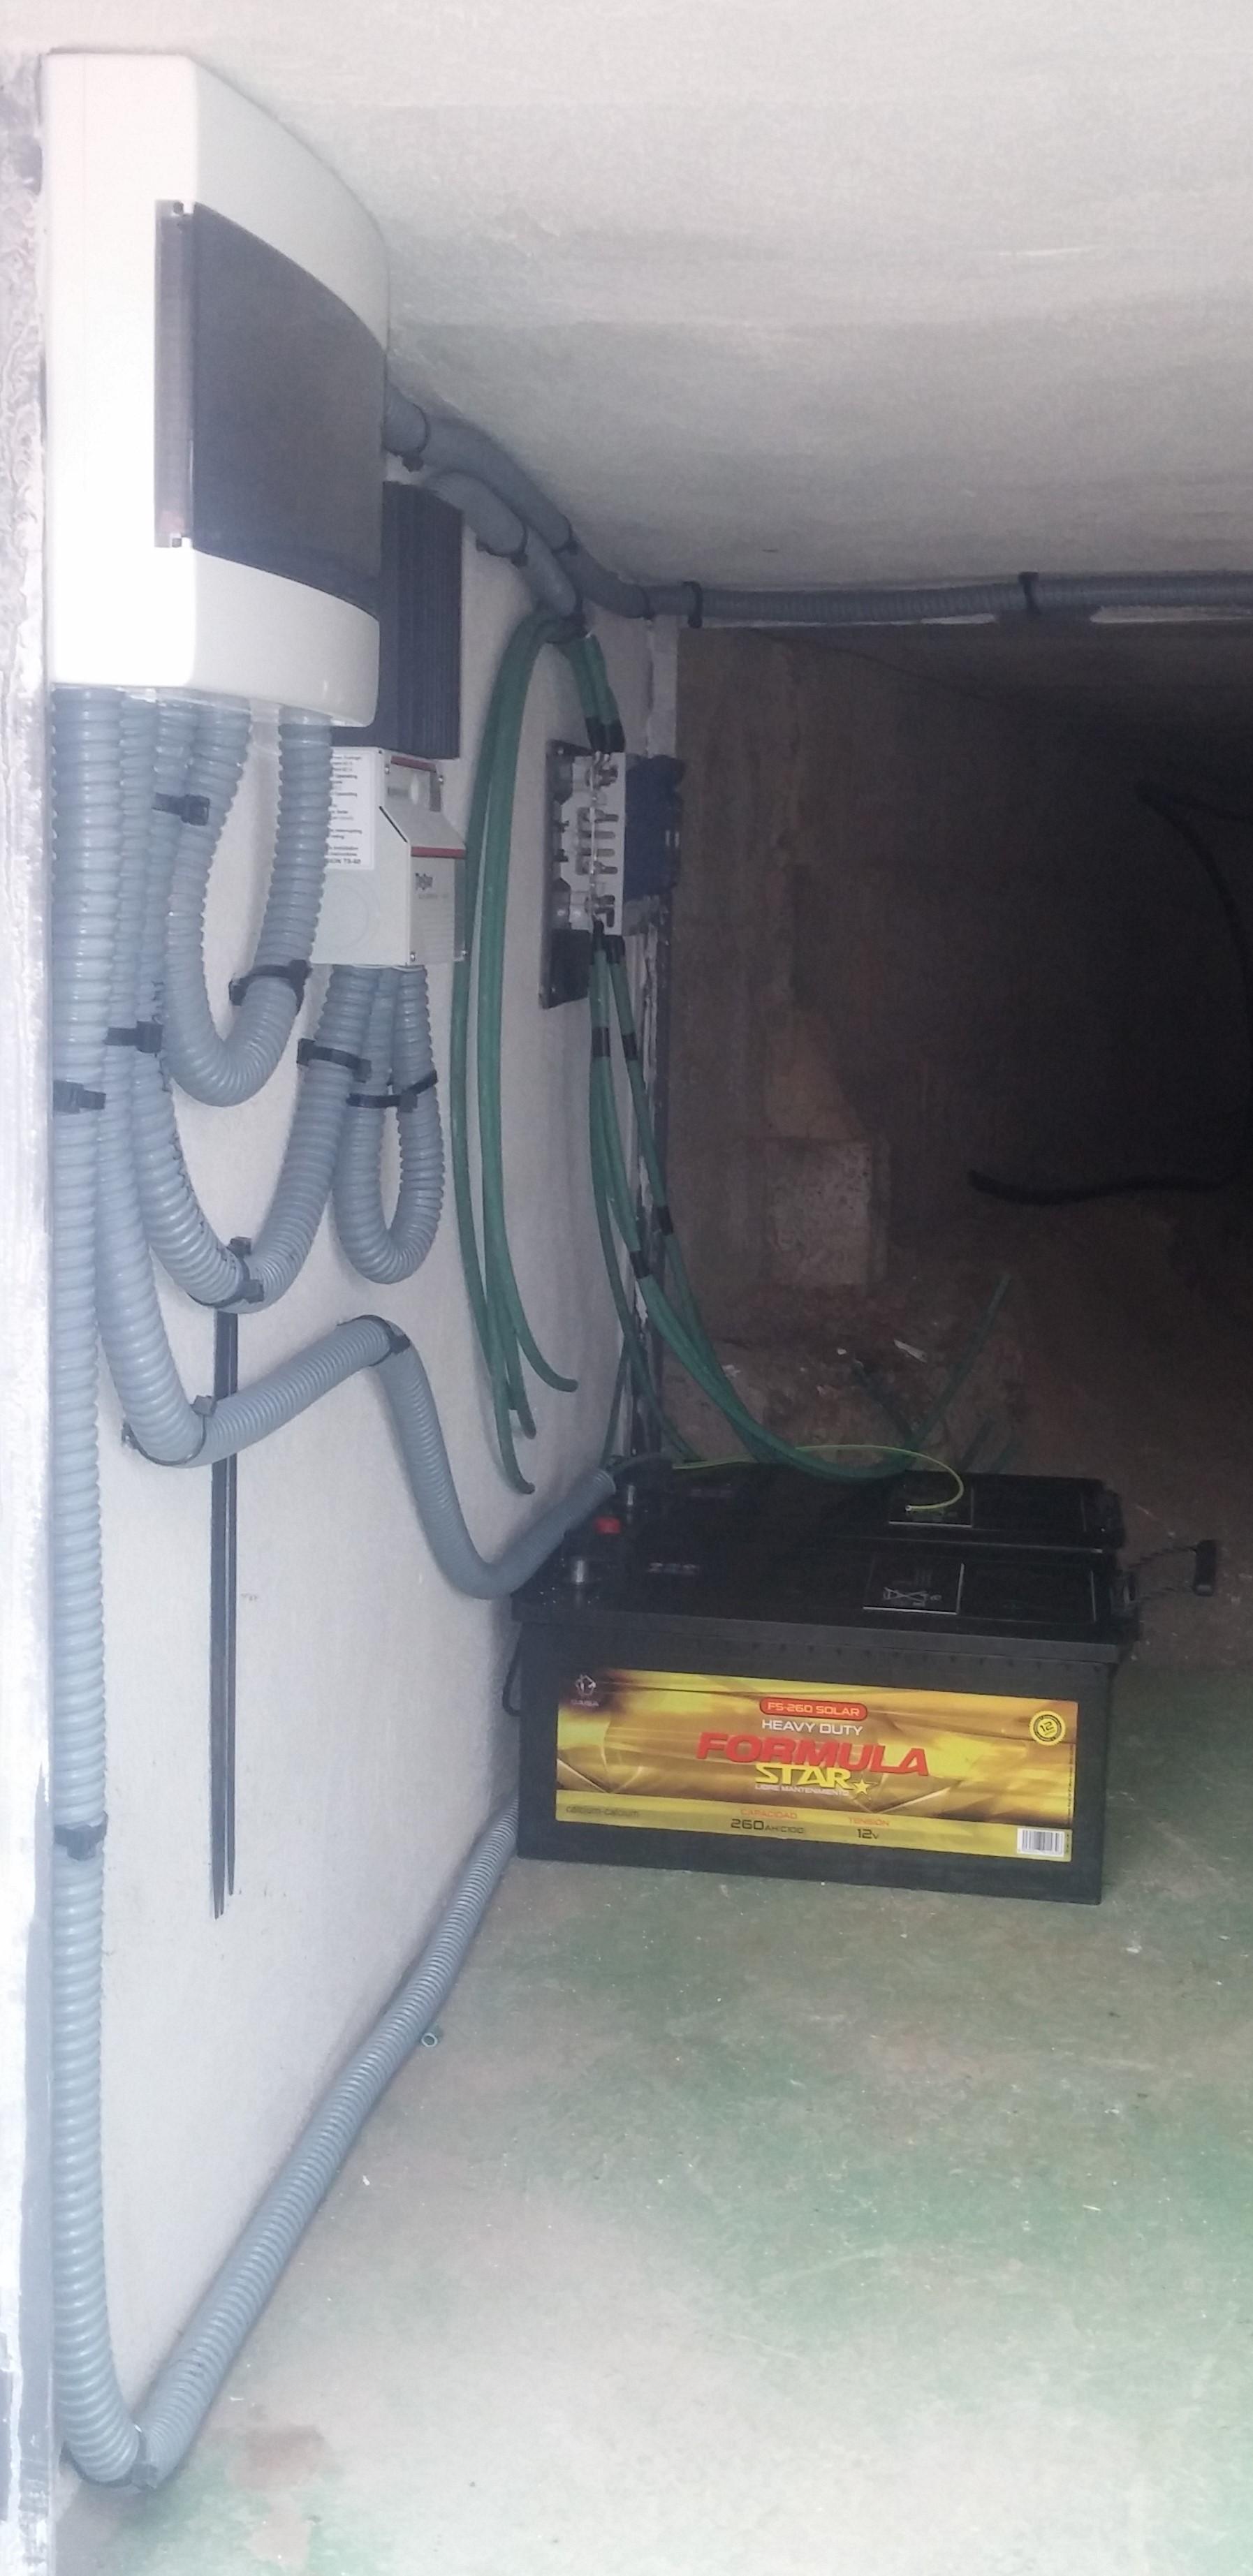 Instalaci n aislada con bater as medano ingenieros - Energia solar tenerife ...